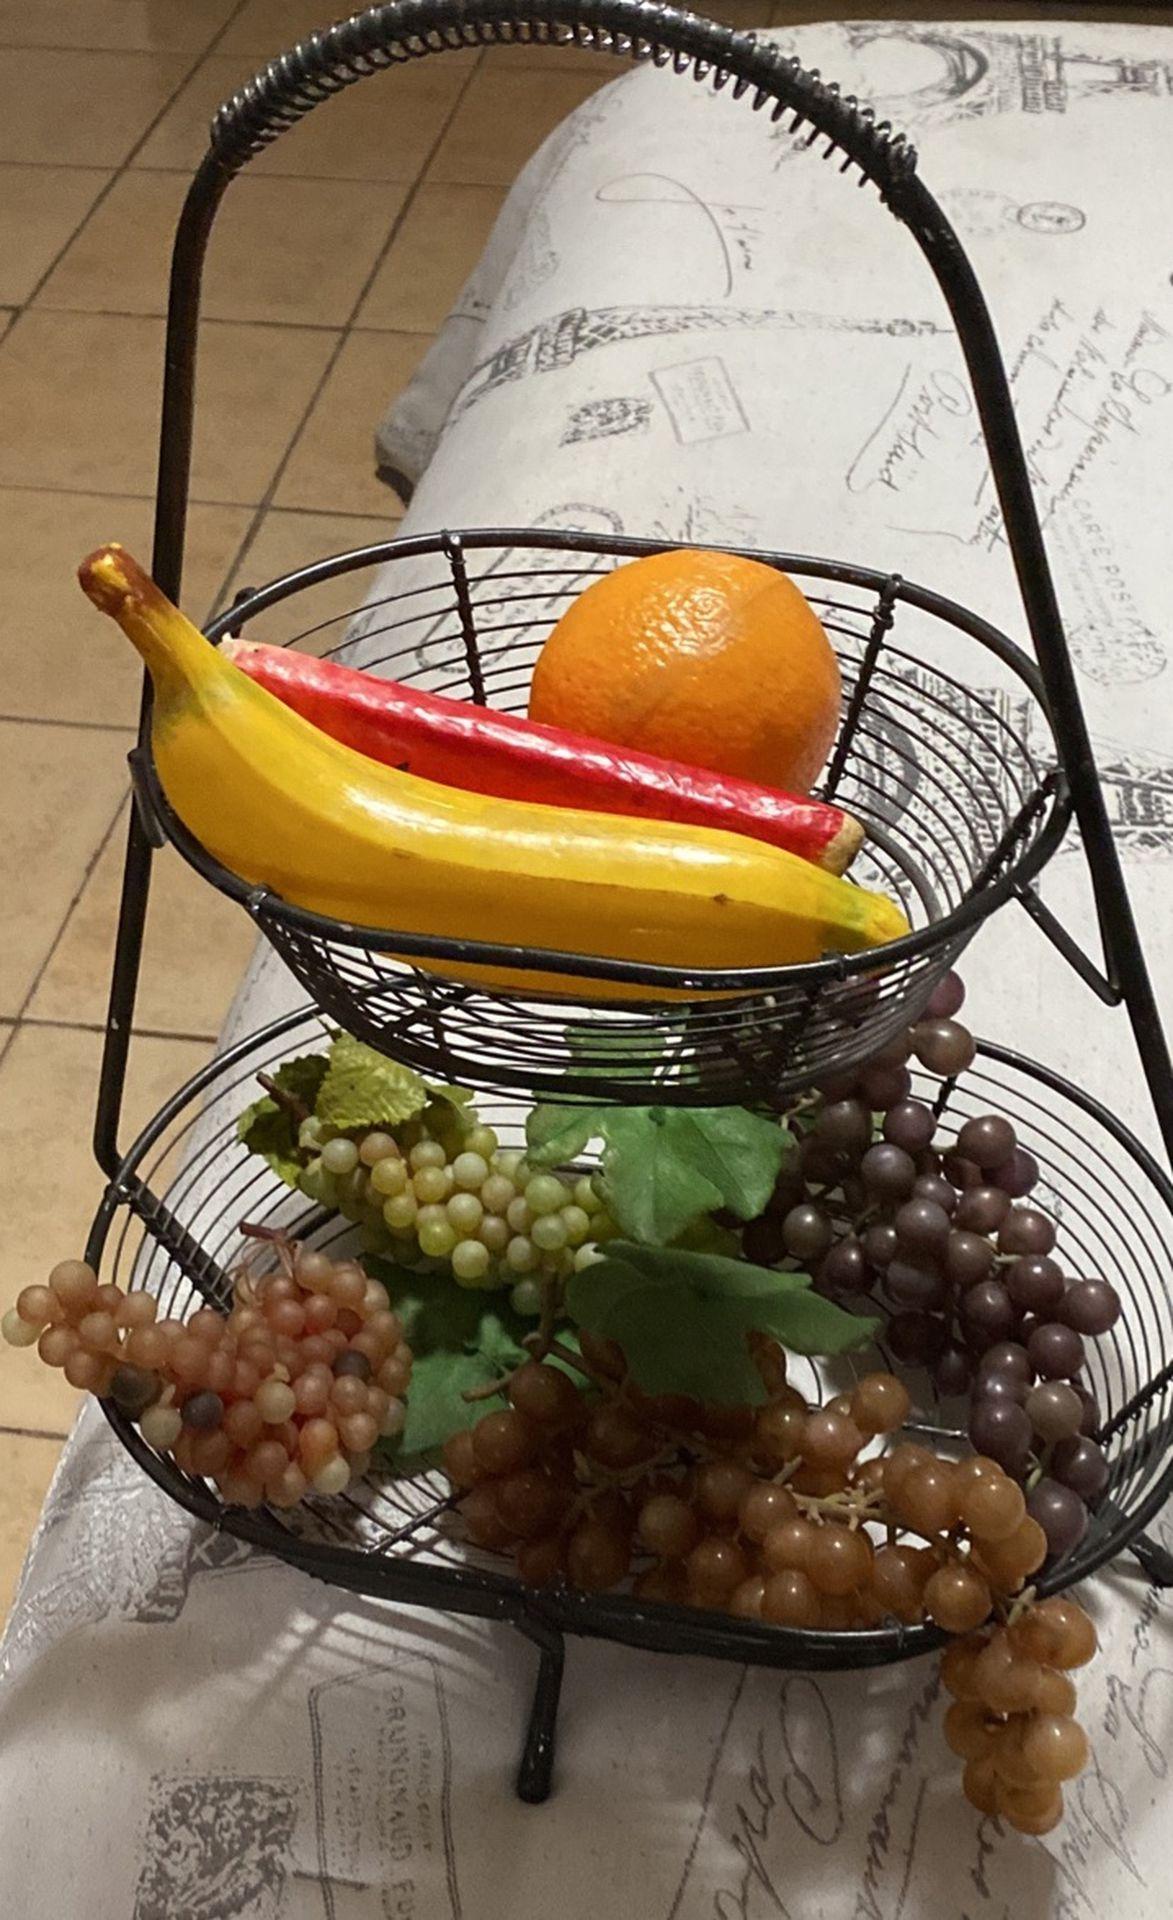 Hold fruit